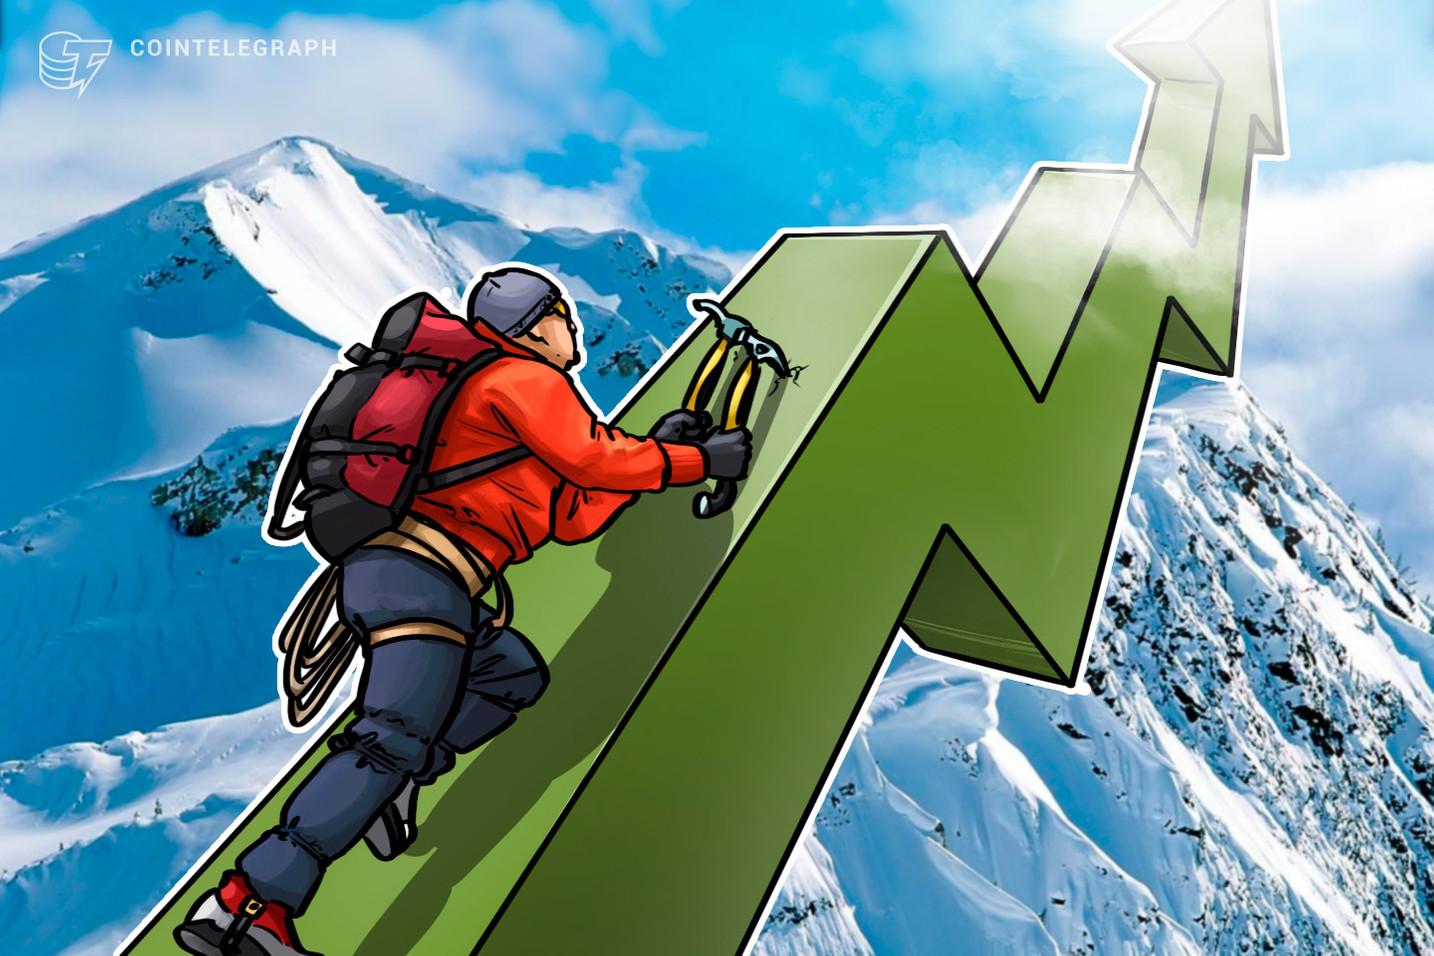 BTC Tantalizingly Close To Smashing $10K Globally, Already There On Asian Markets